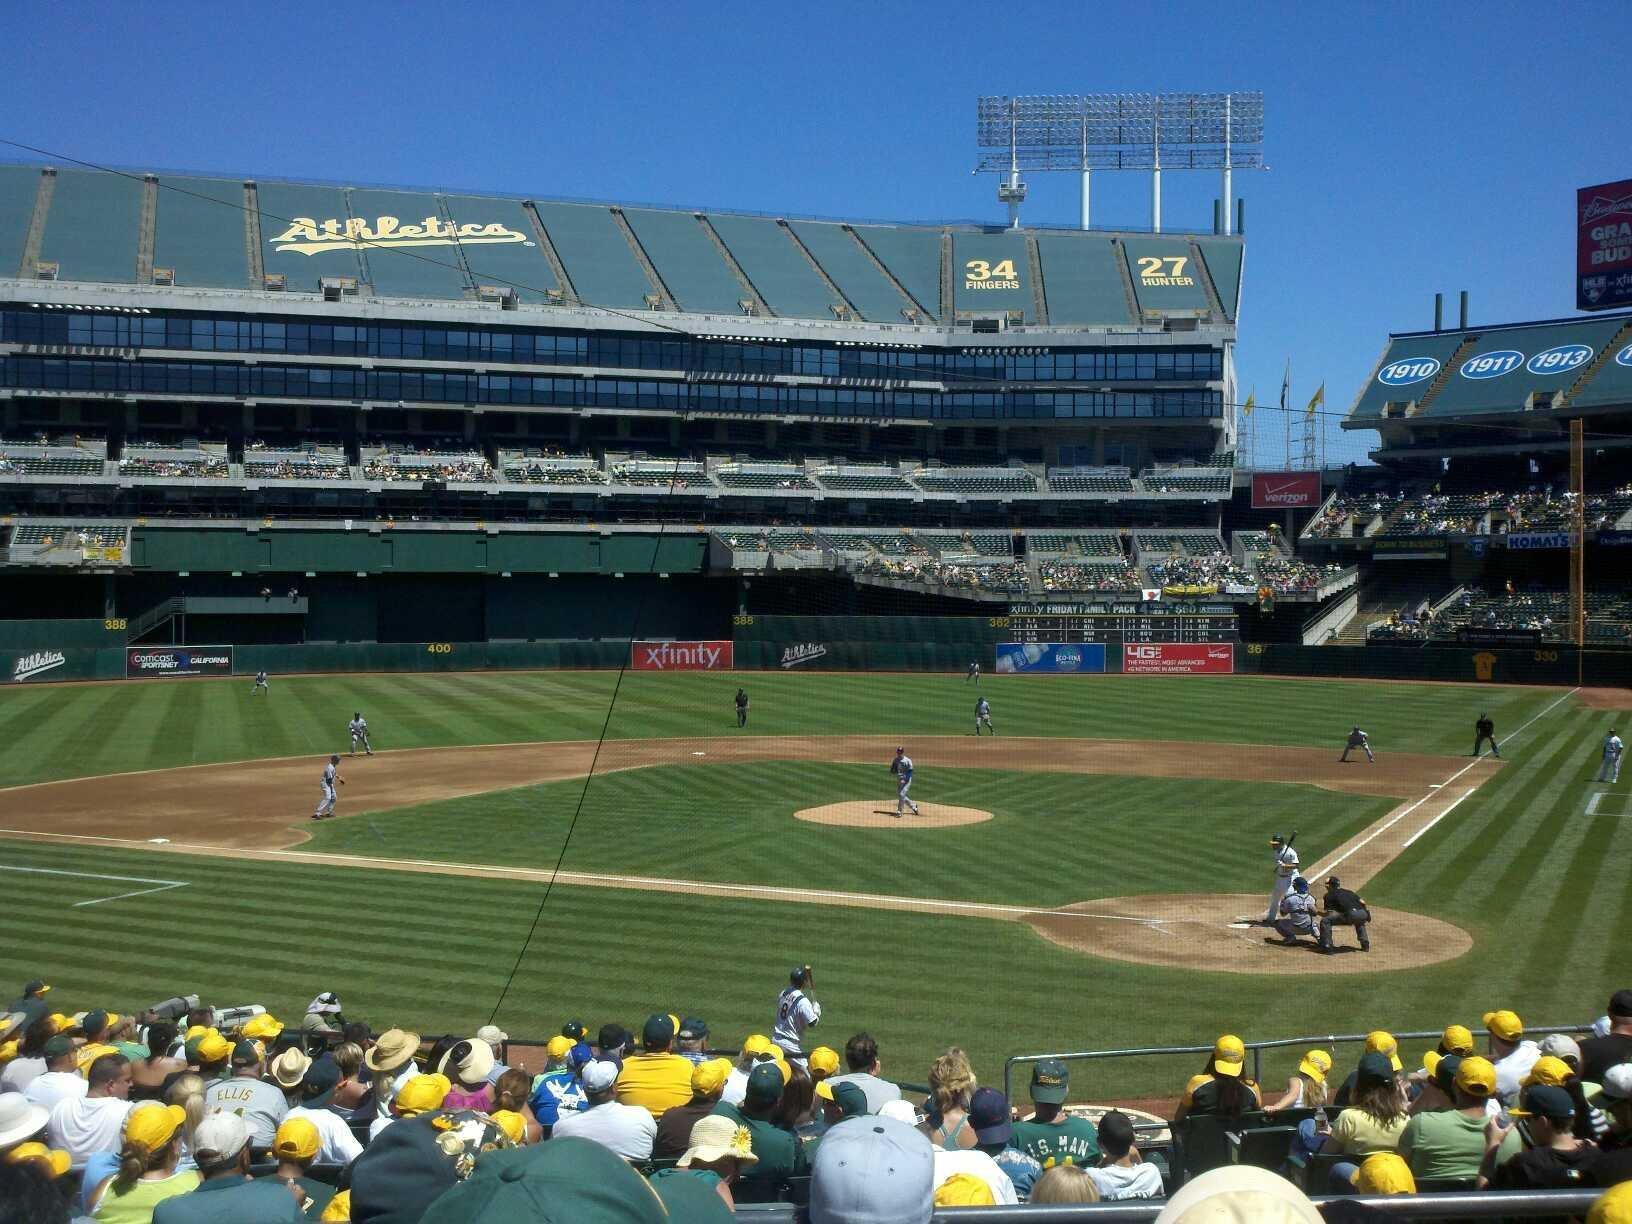 Oakland Coliseum Section 119R Row 25 Seat 6